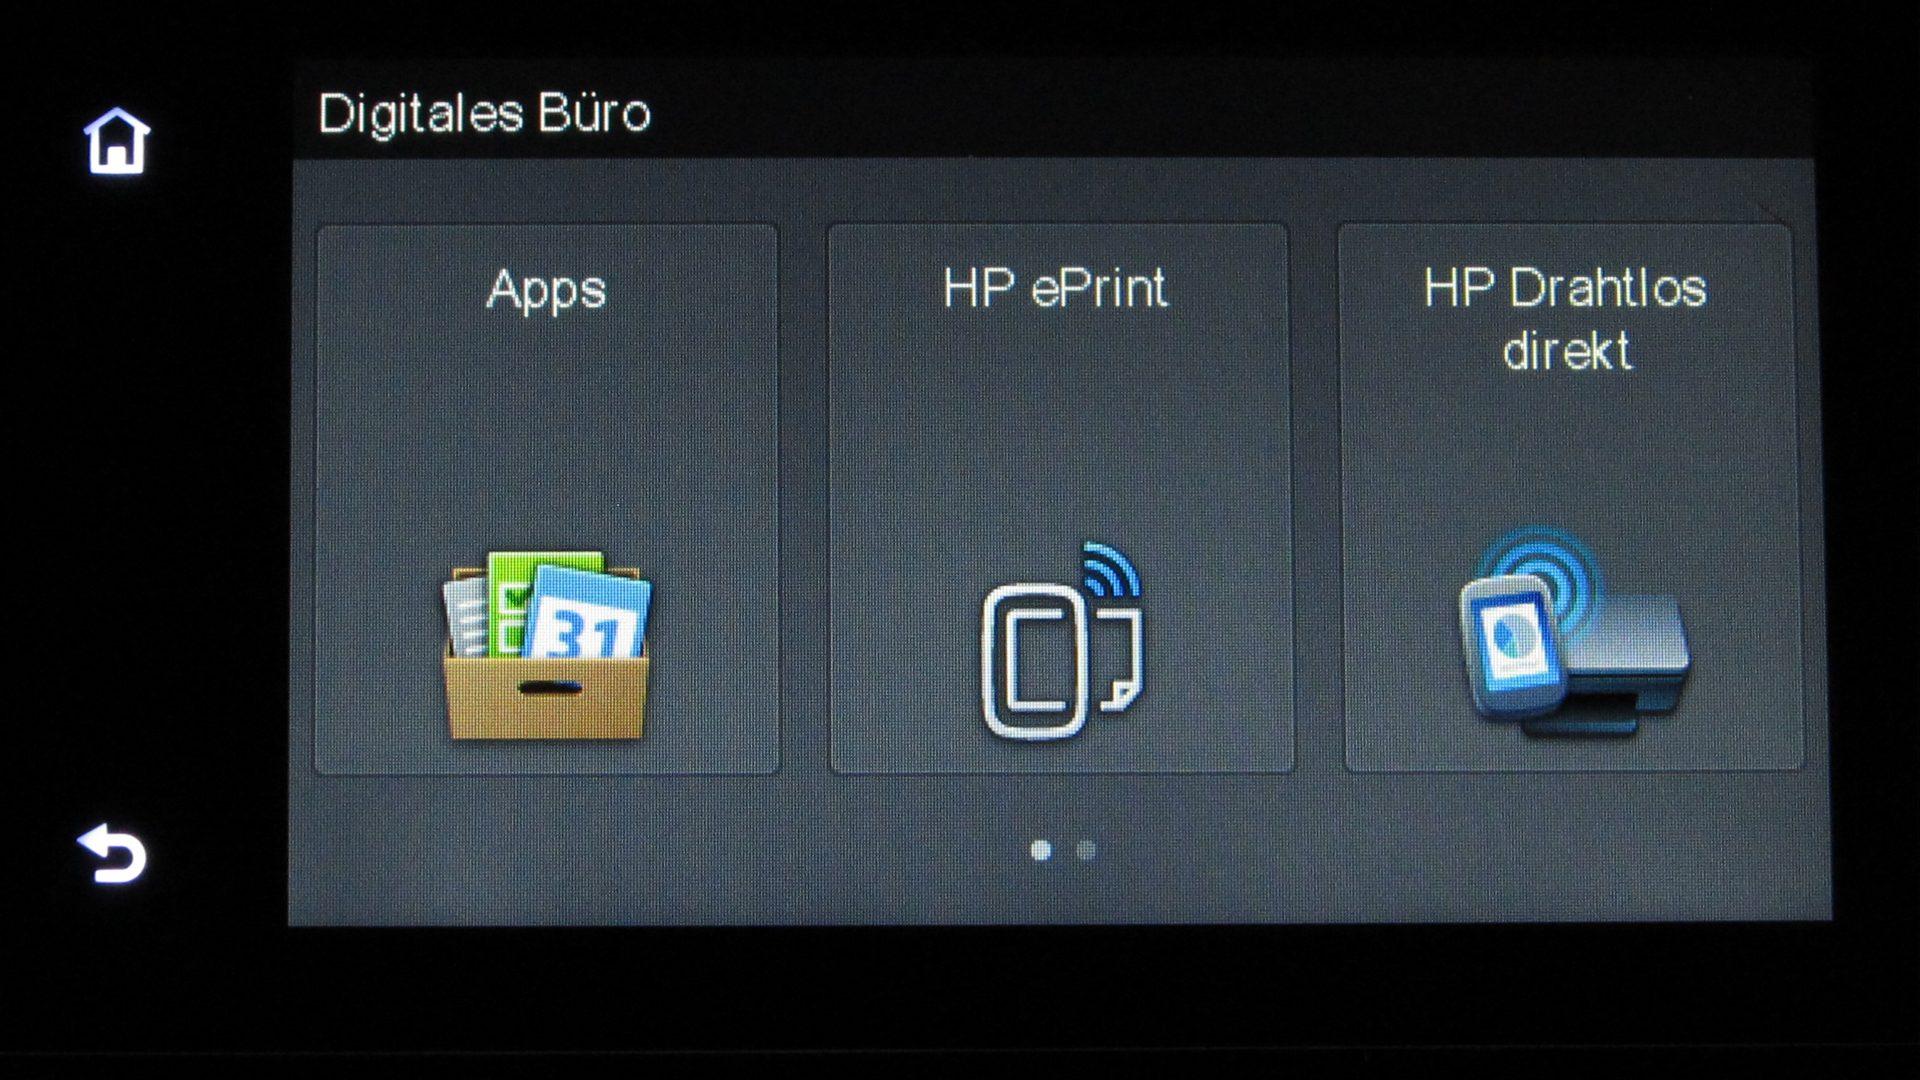 HP-Officejet-Pro-8620–Display-Digitales-Buero